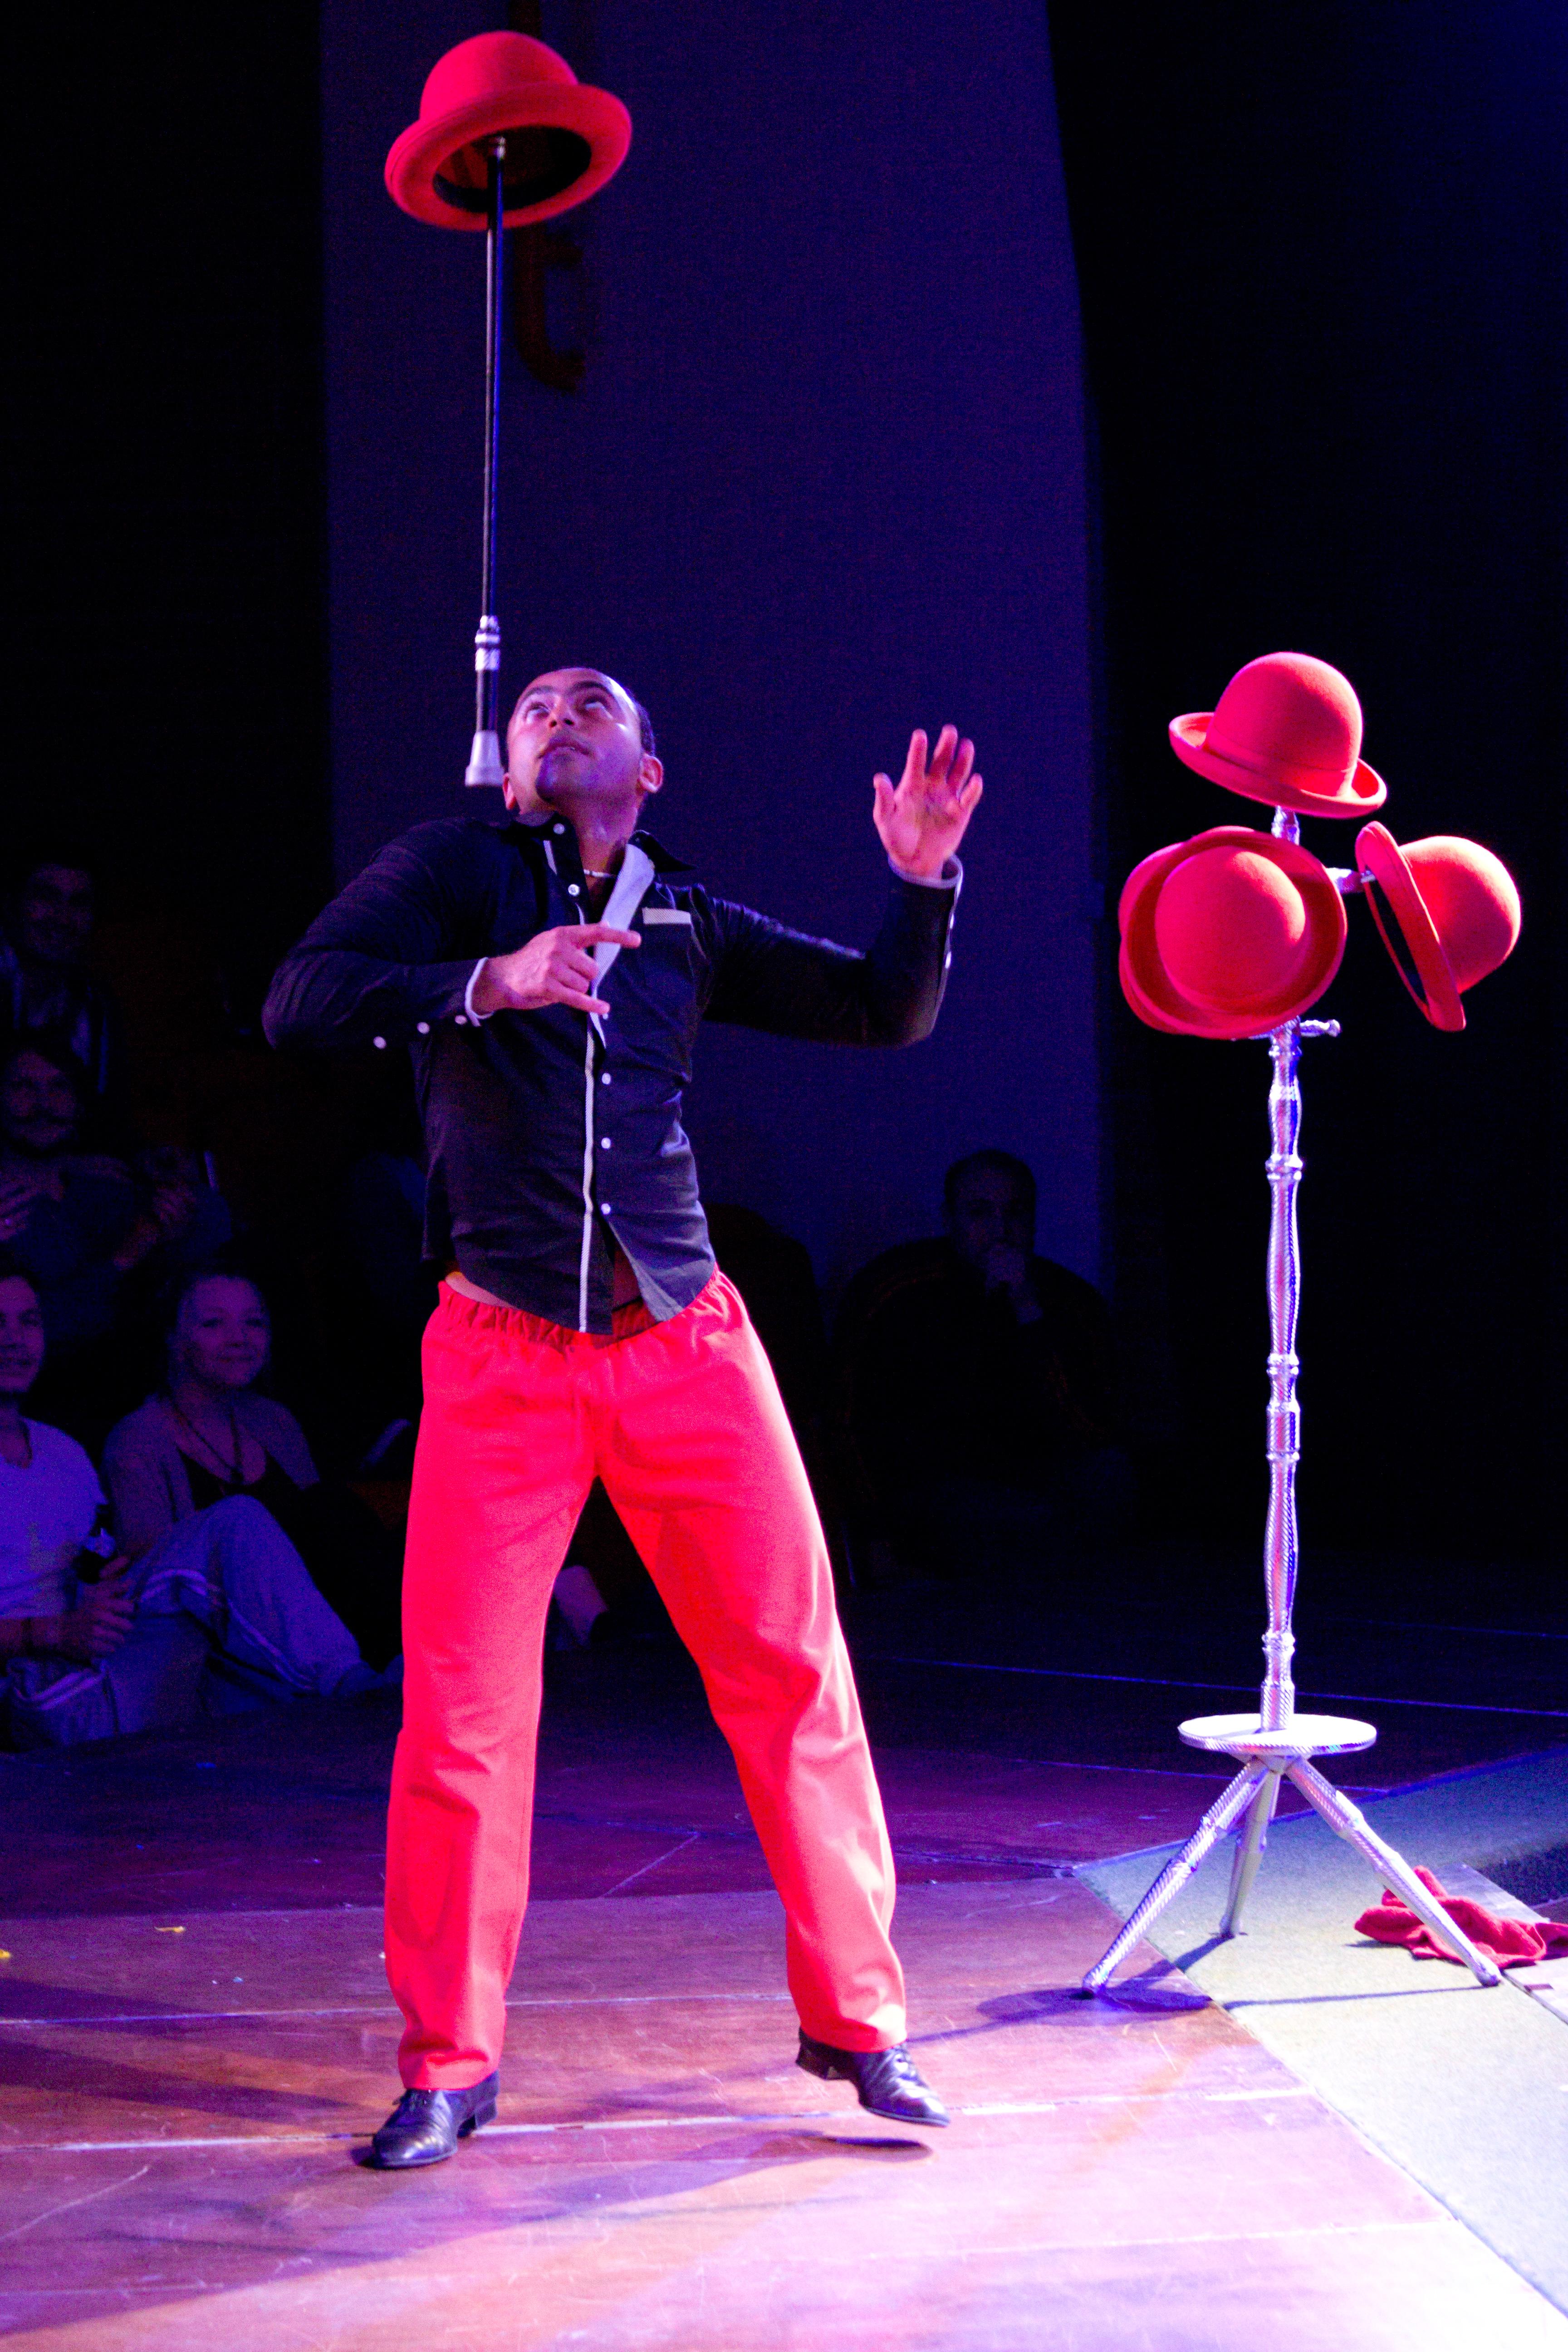 Nürnberg Convention 2013: Gala Show.